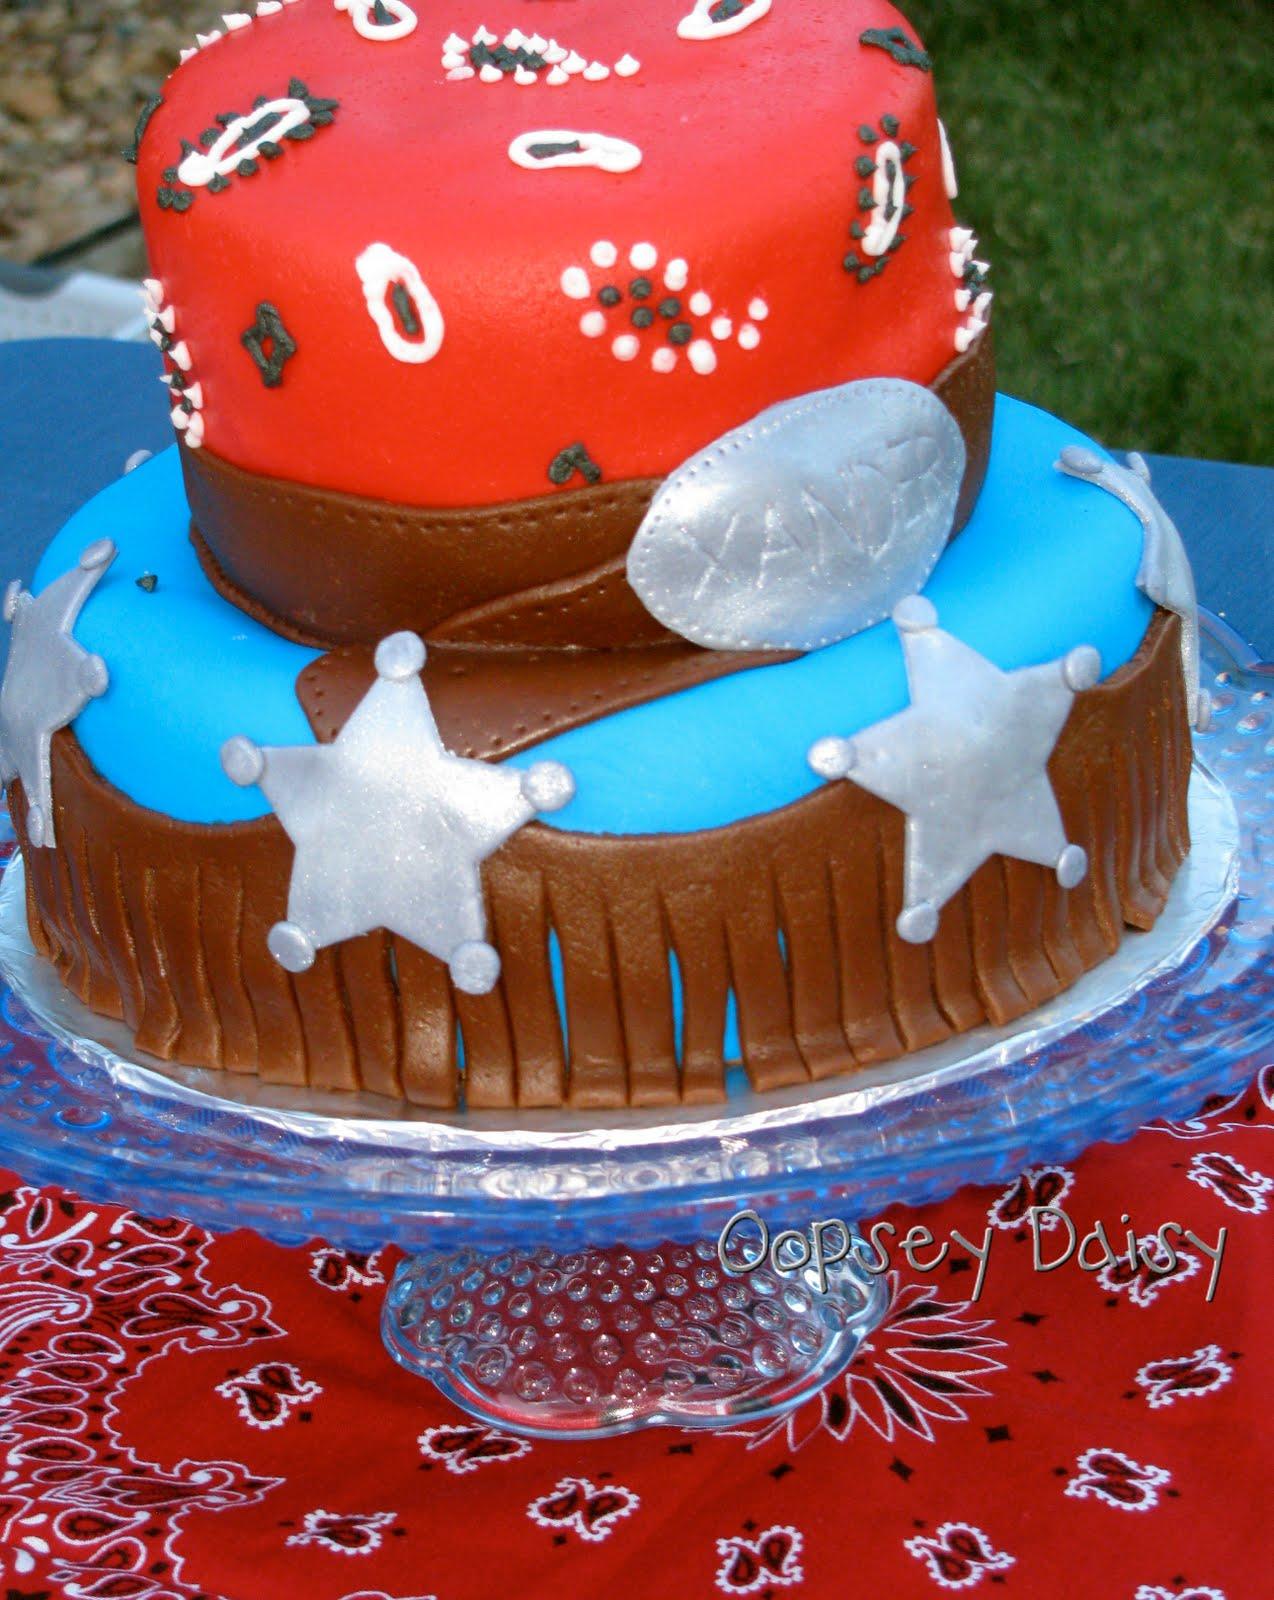 Personalized Birthday Cakes Asda